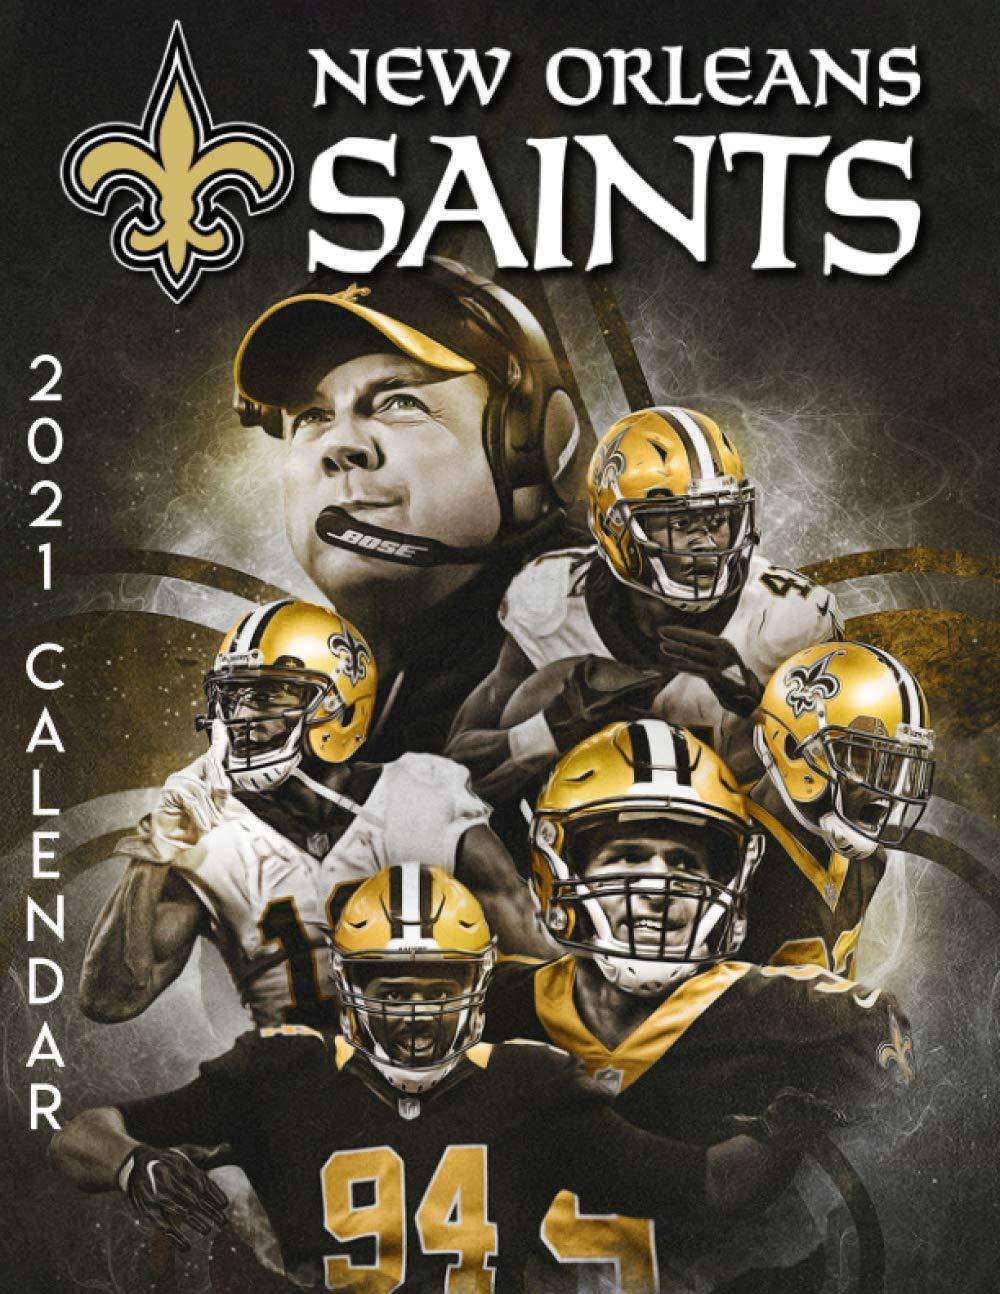 New Orleans Calendar 2022.New Orleans Saints 2021 Calendar Sports Teams Calendar 9798583904341 Amazon Com Books